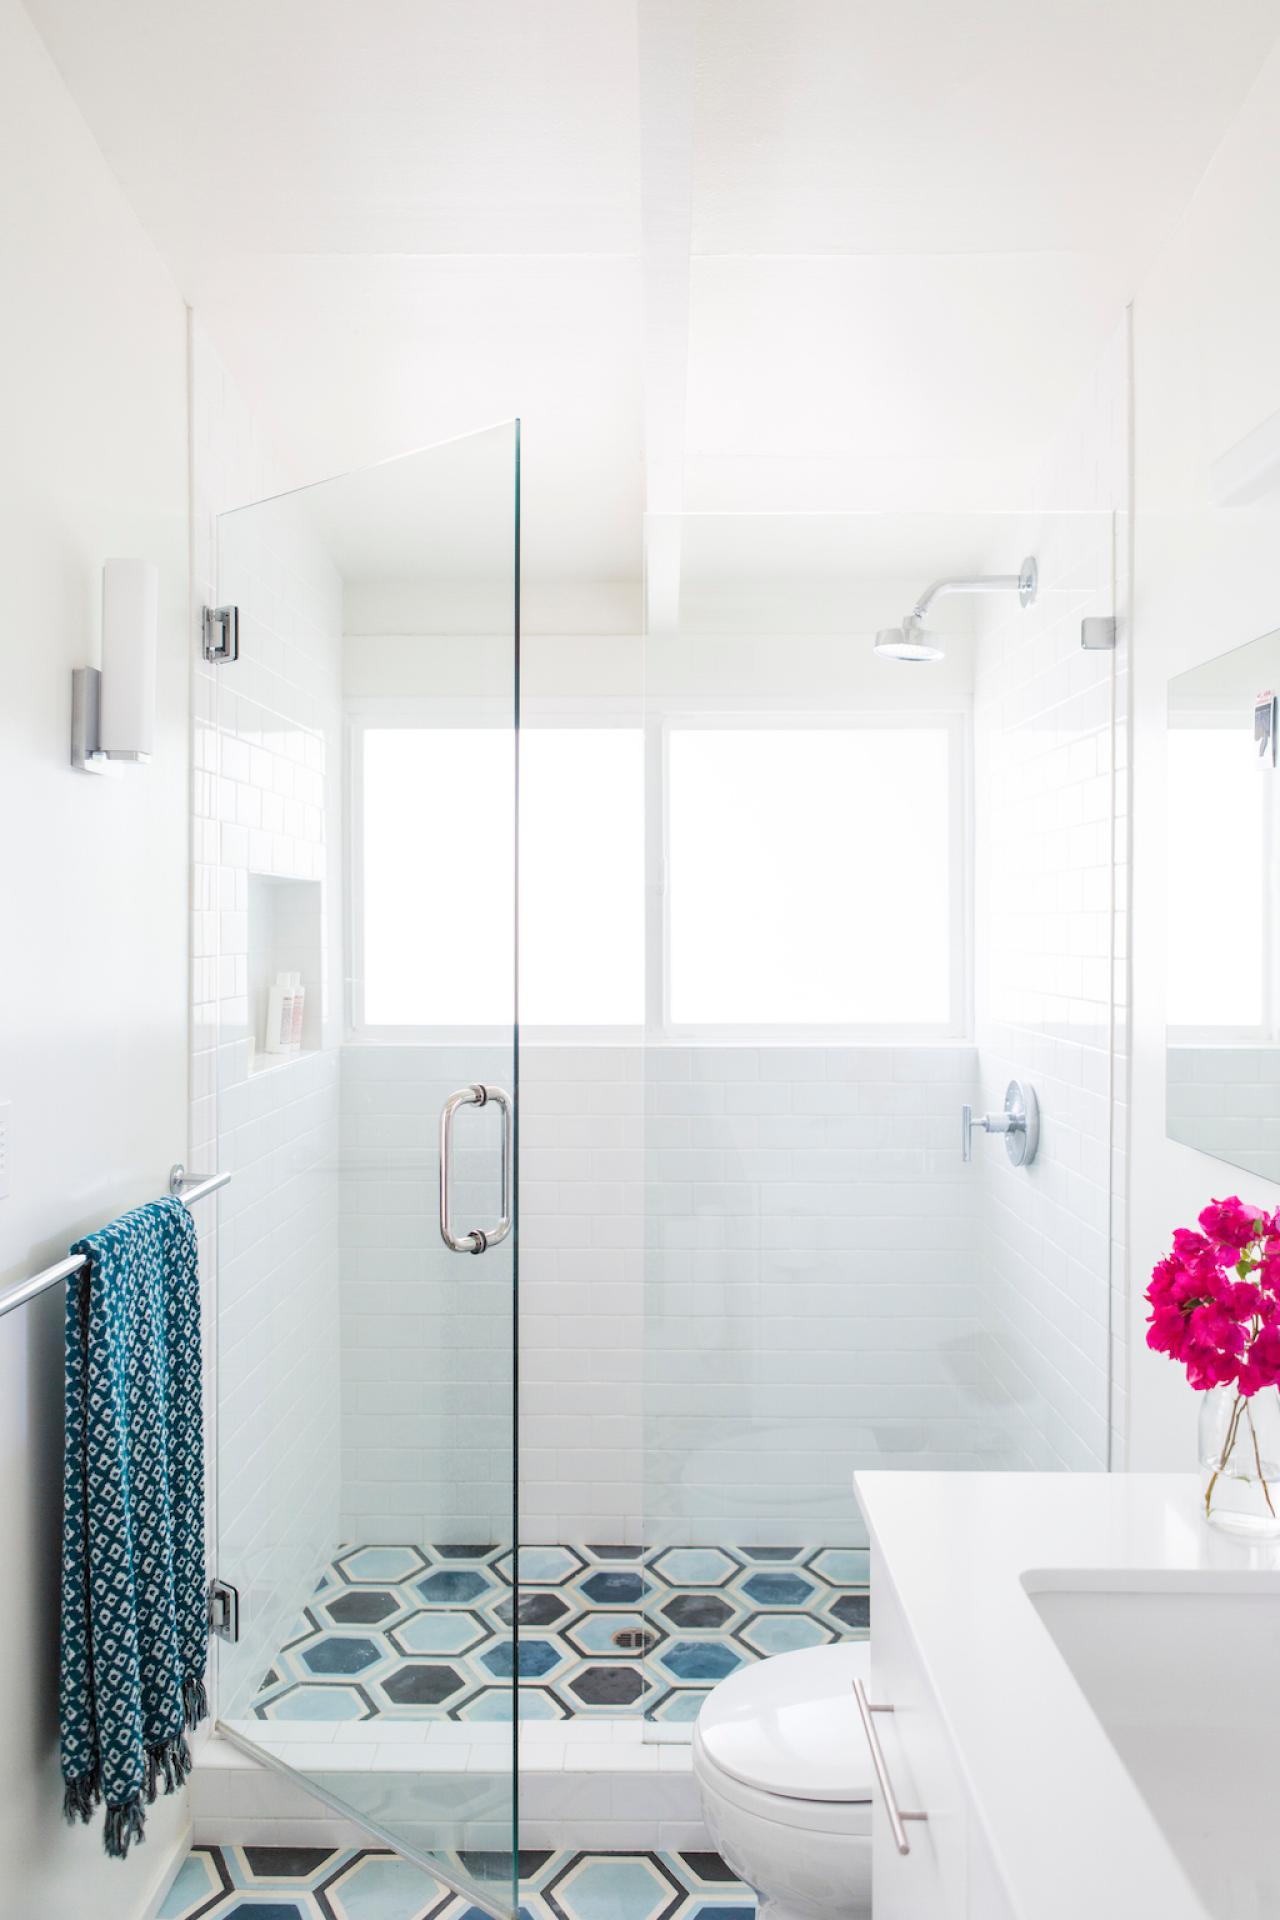 Top 20 Bathroom Tile Trends Of 2017 Hgtv 39 S Decorating